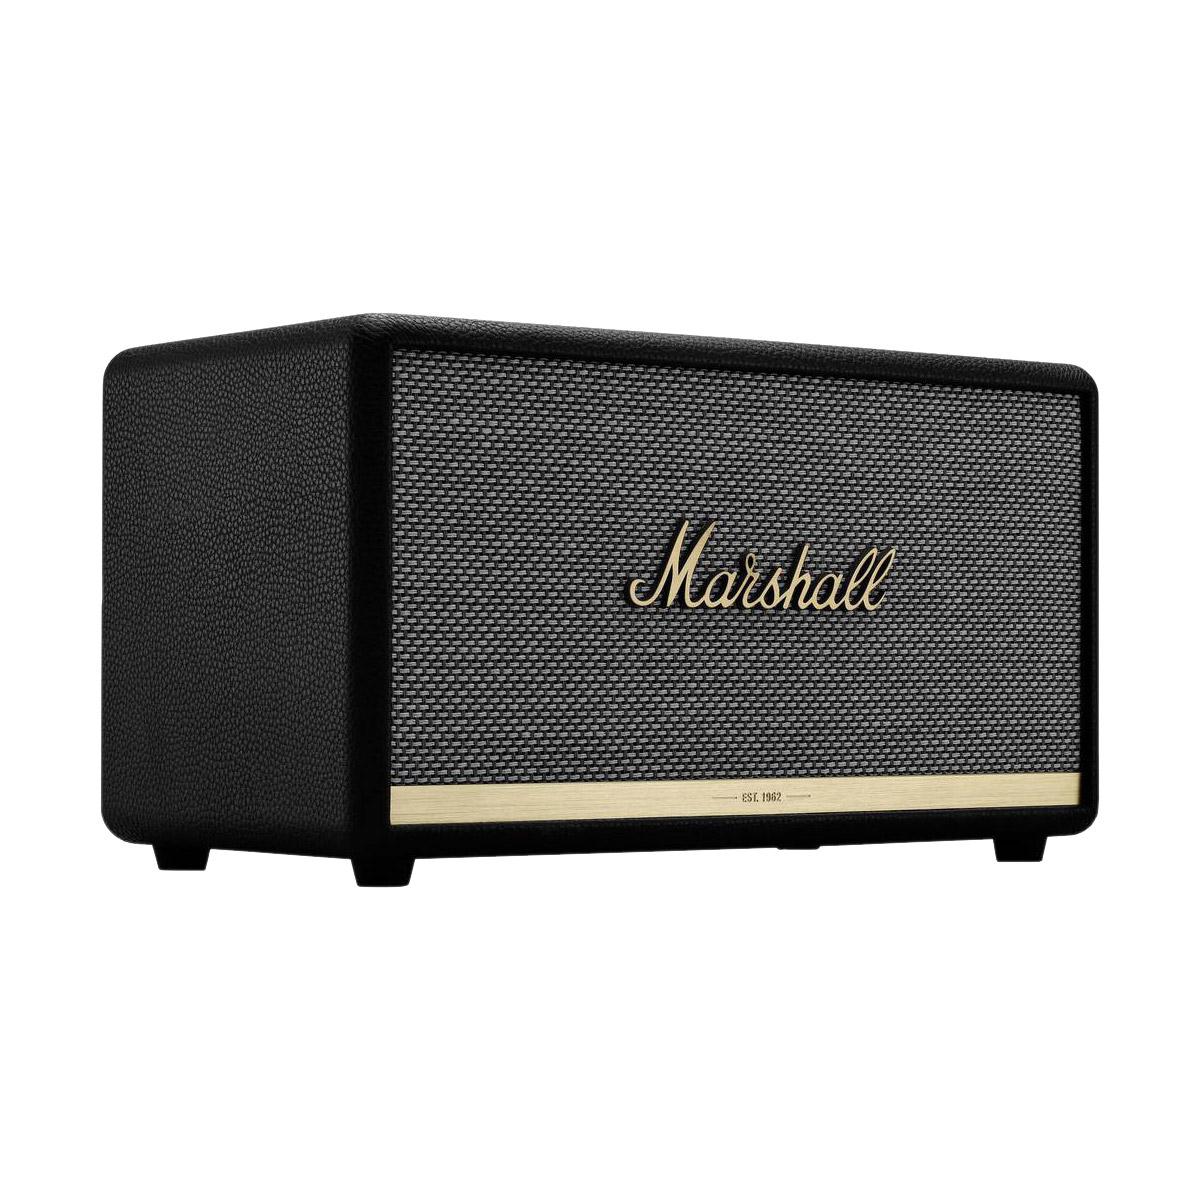 Enceinte Bluetooth Marshall Stanmore II - Noir